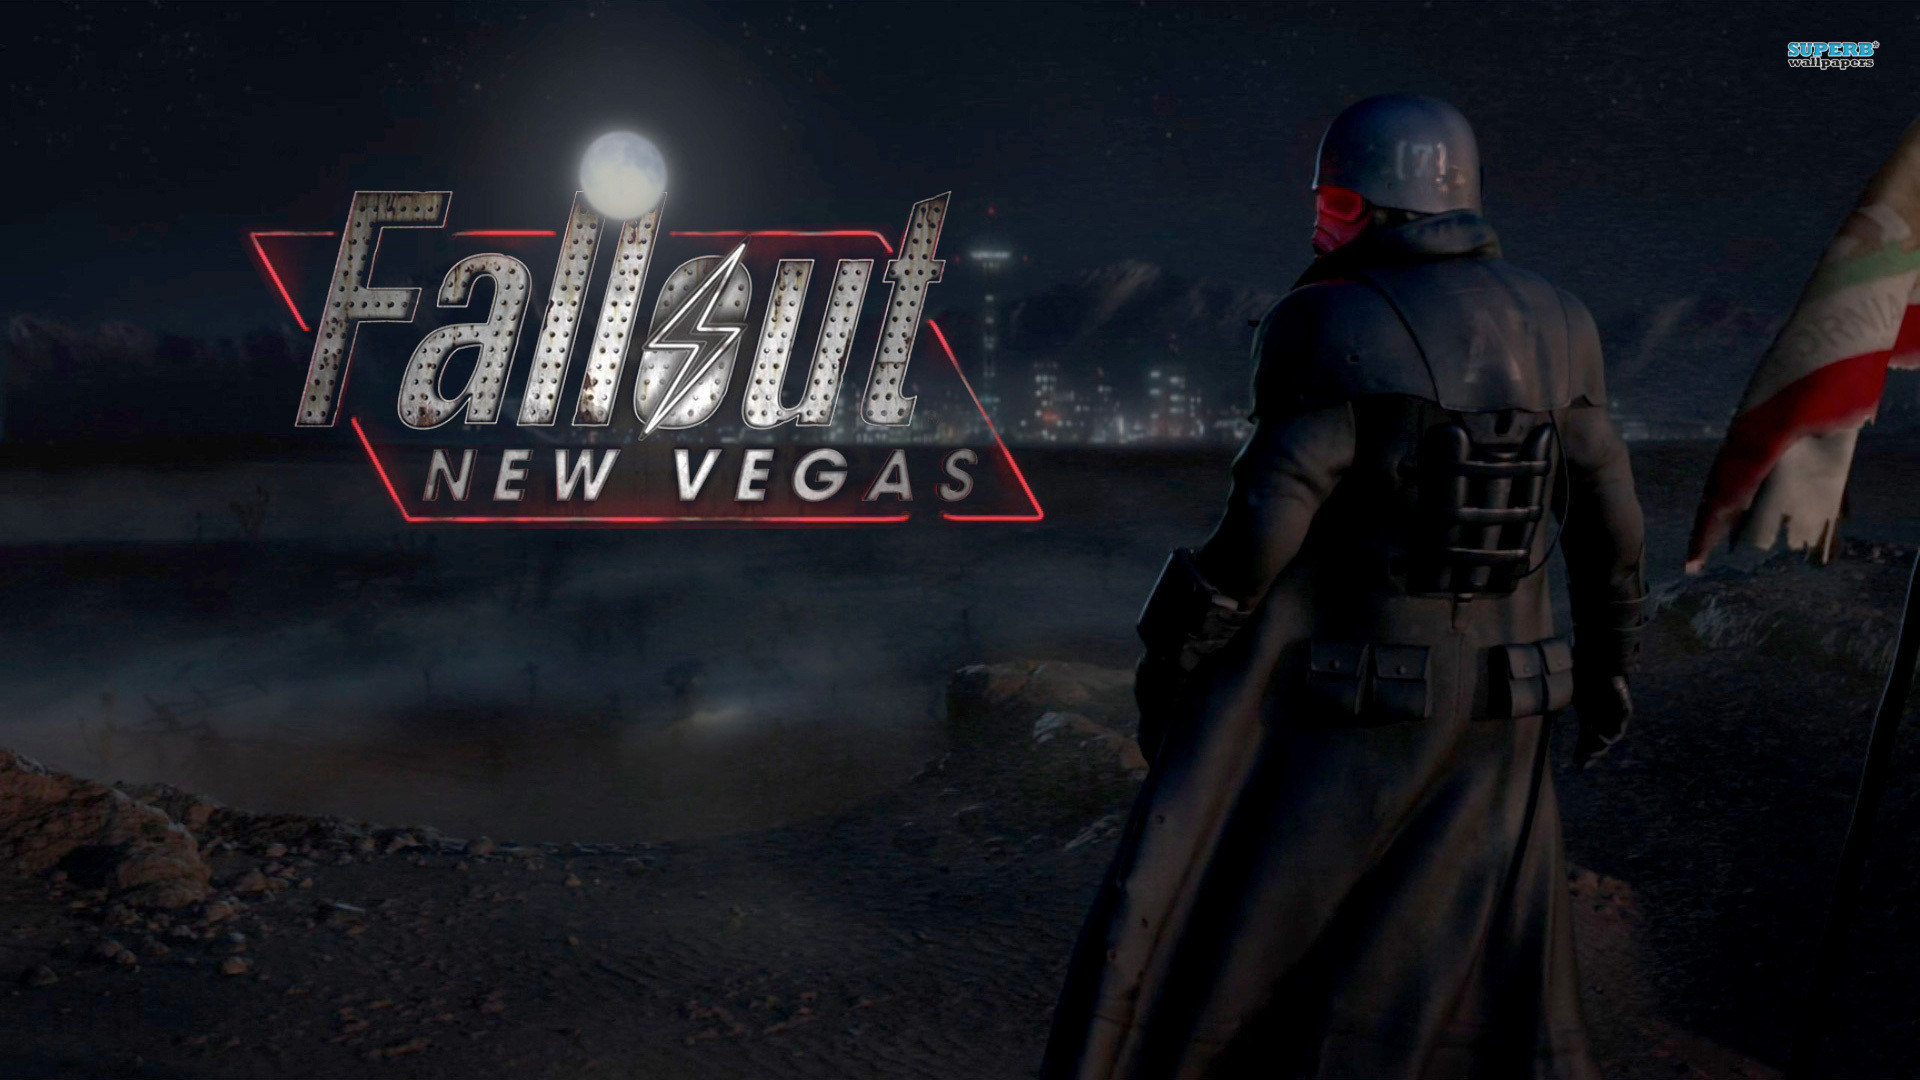 Fallout New Vegas Wallpaper Hd 1920×1080